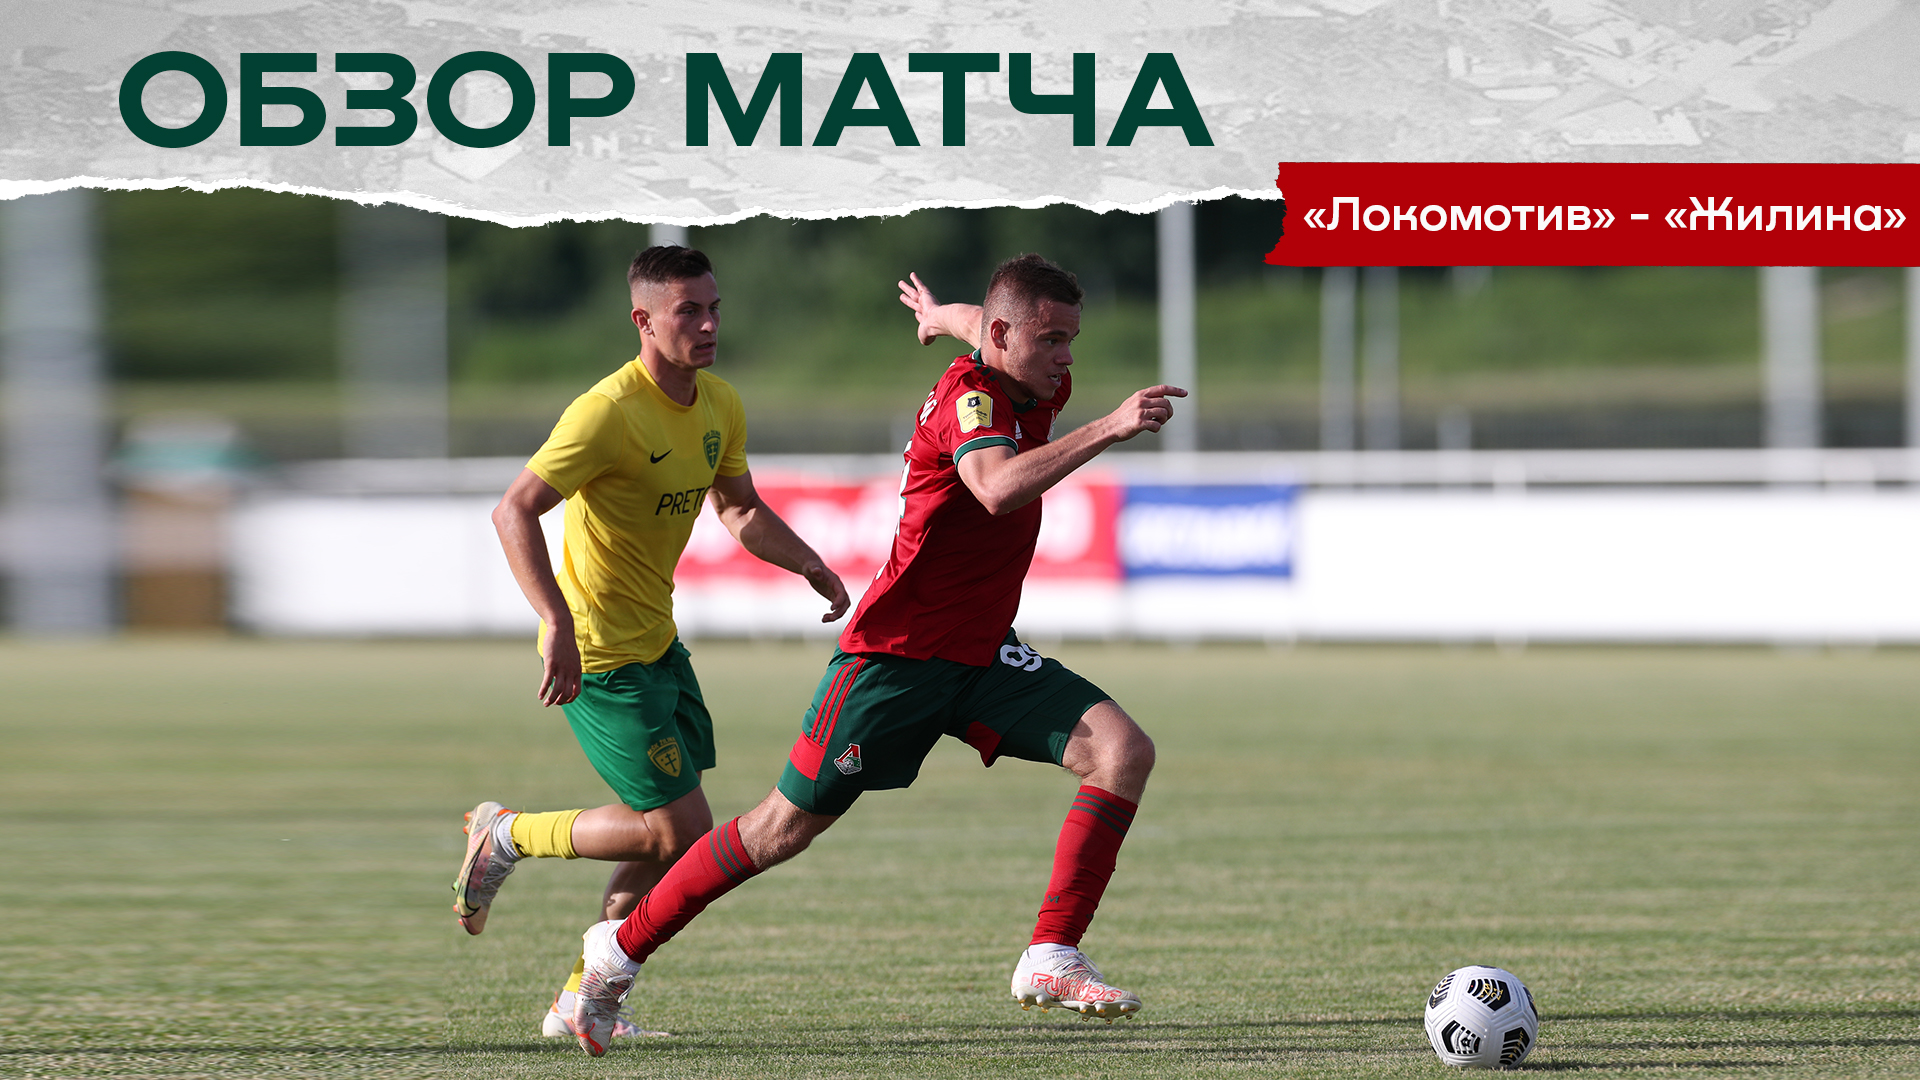 Lokomotiv – Zilina highlights // Khudyakov and Babkin interview